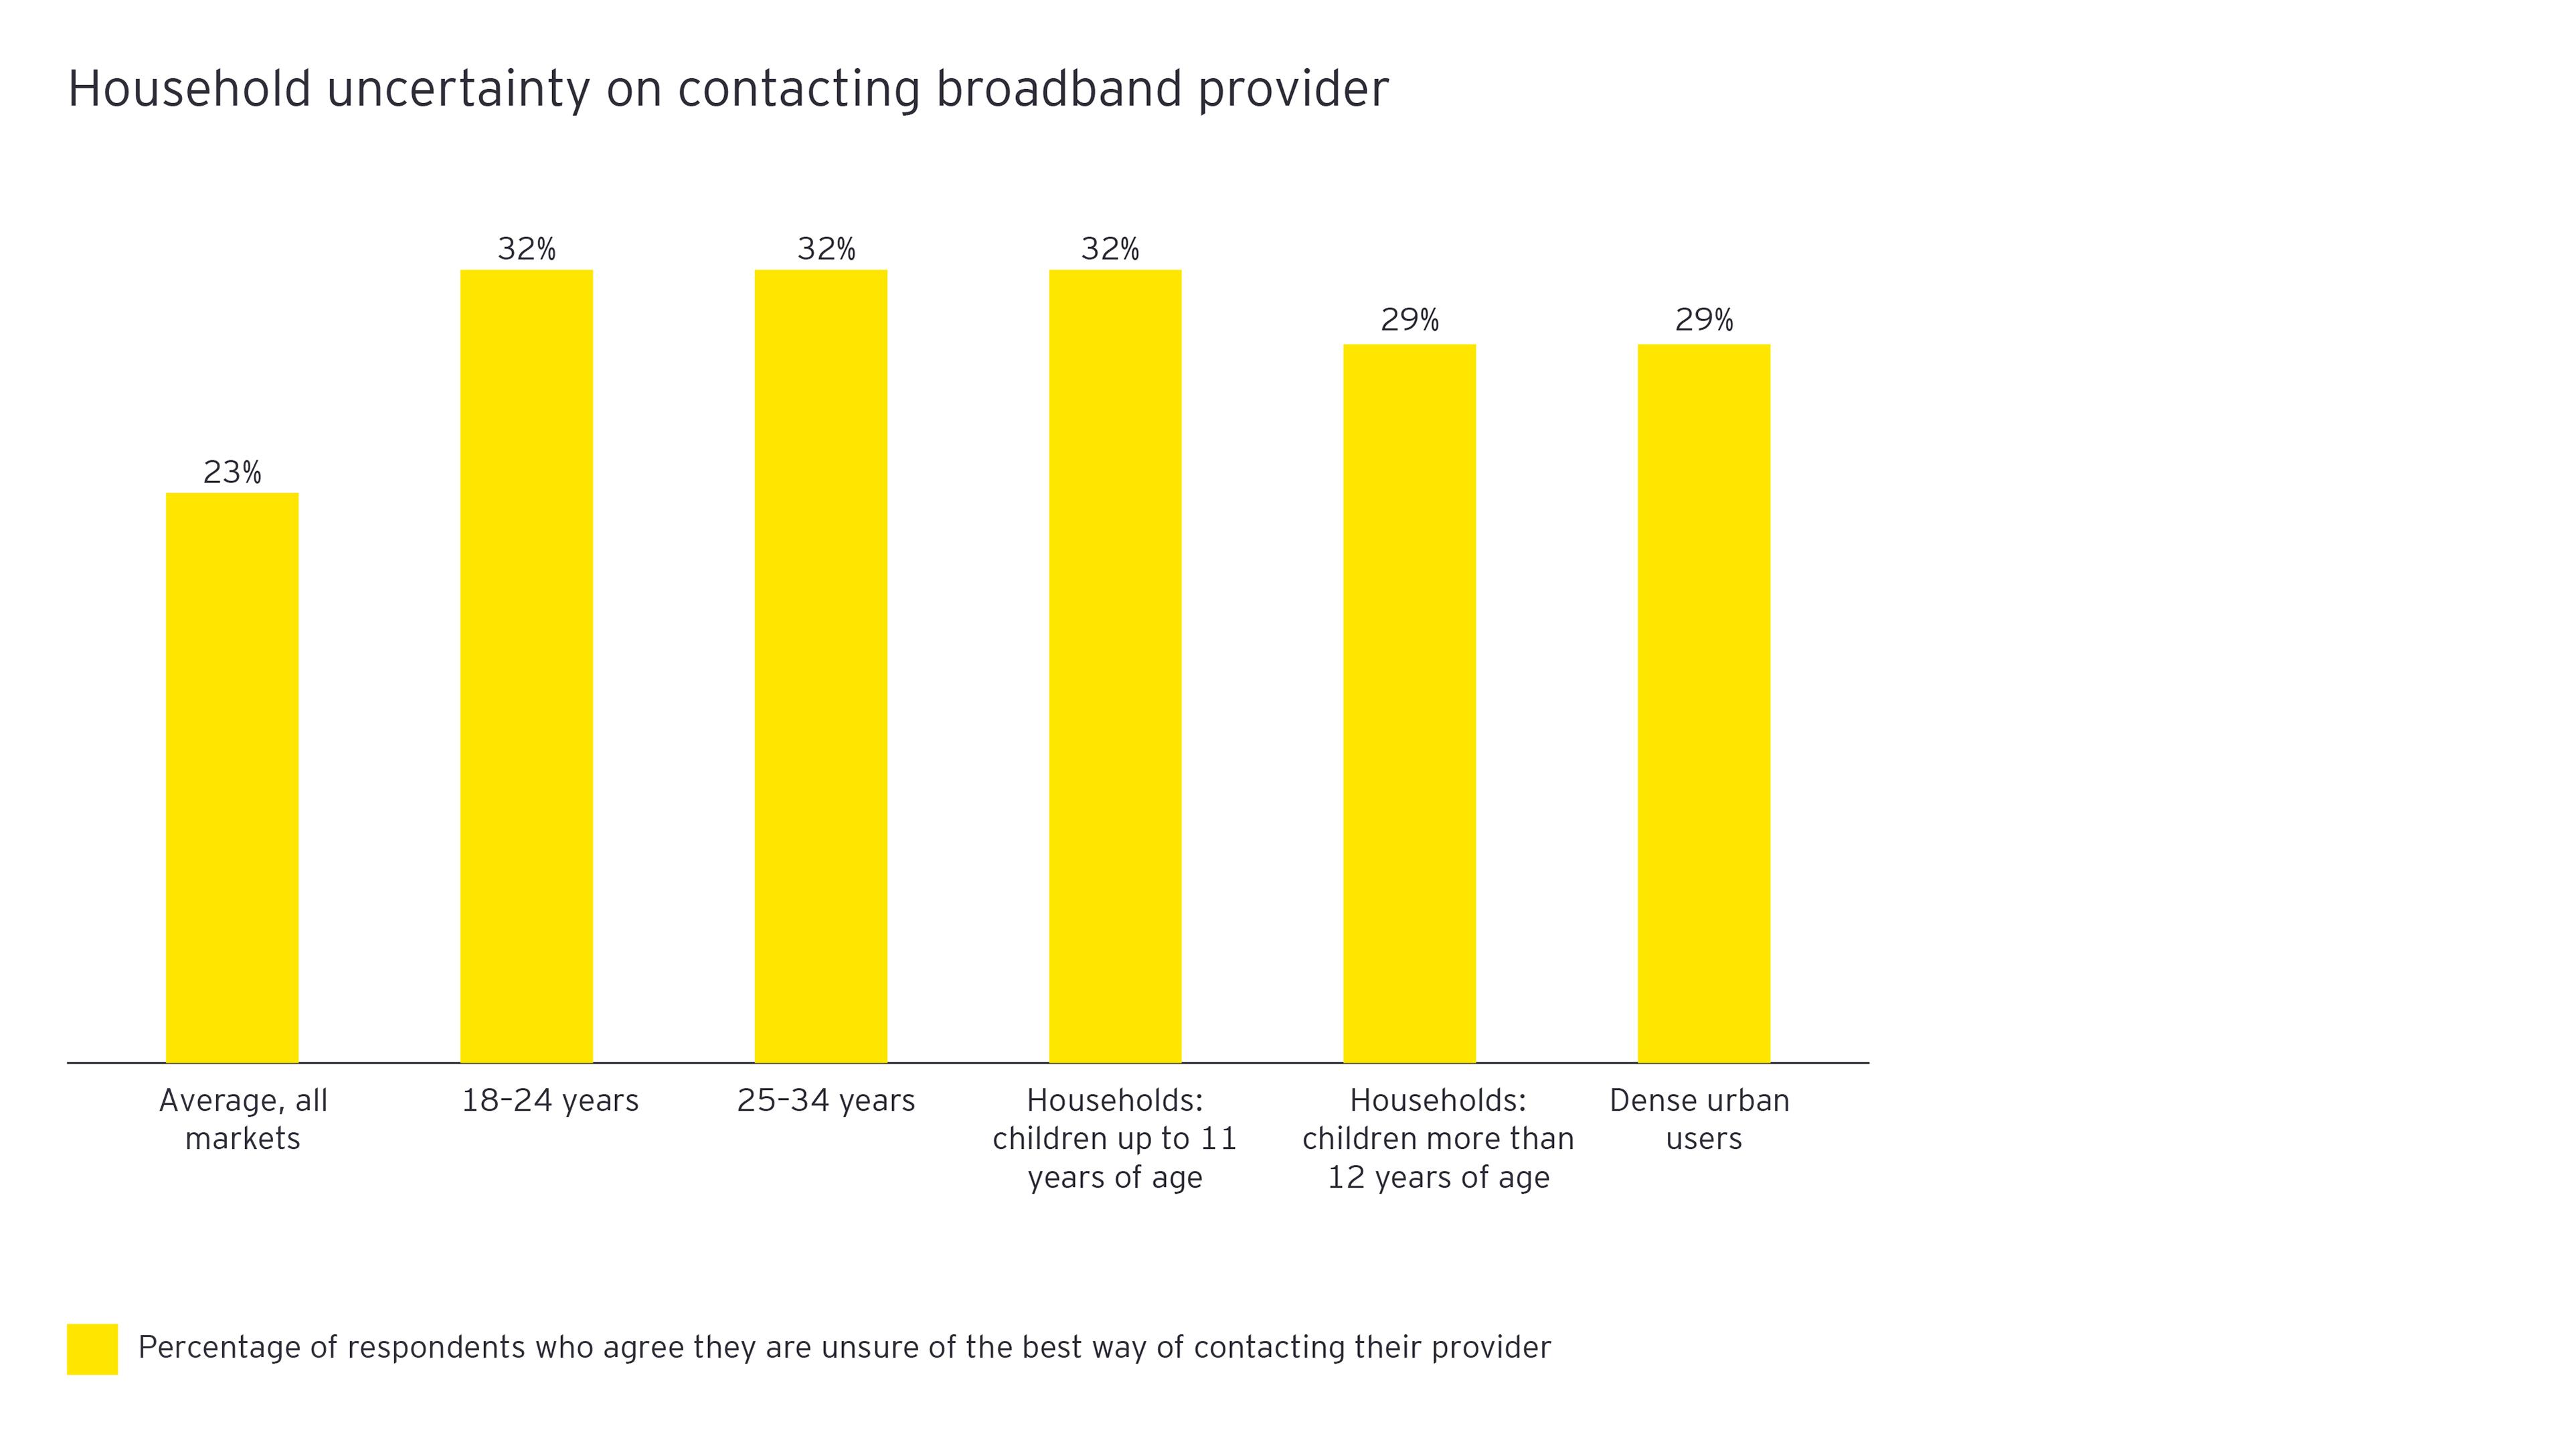 Figure 8: Household uncertainty on contacting broadband provider